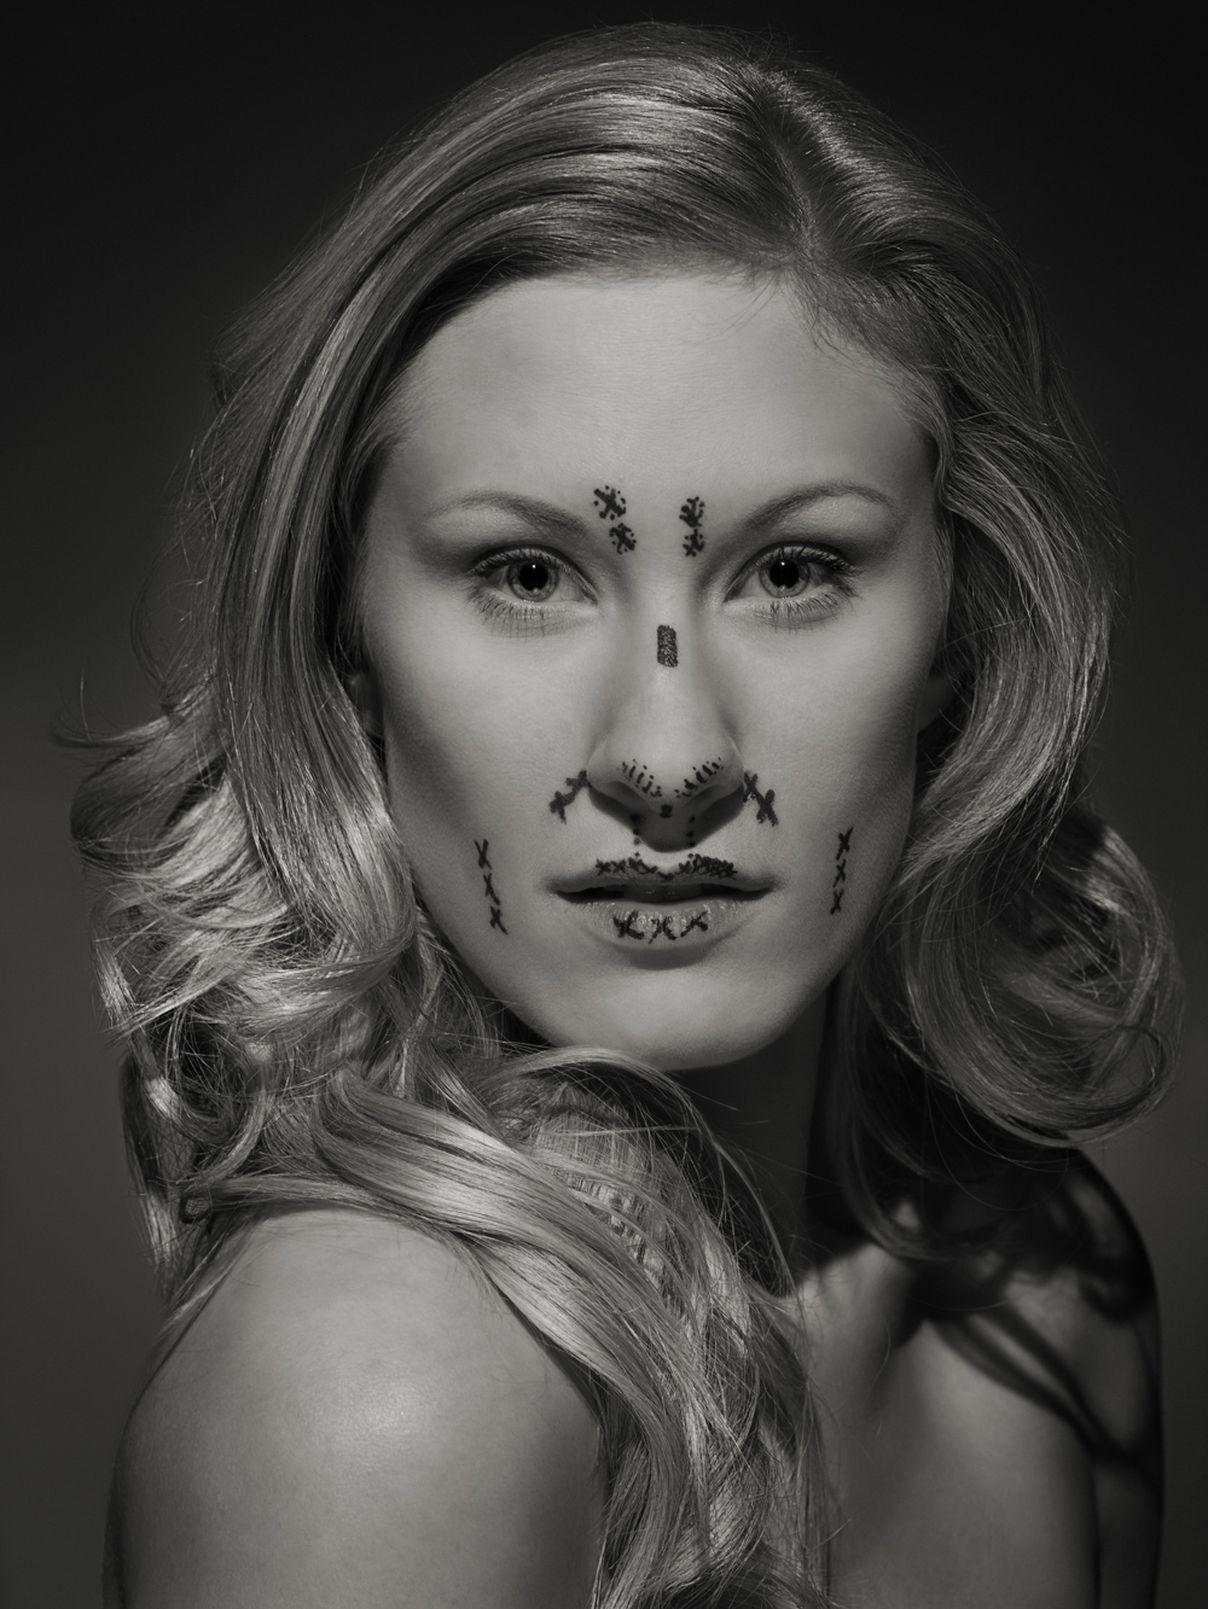 mask-perfection-plastic-surgery-everythingwithatwist-04